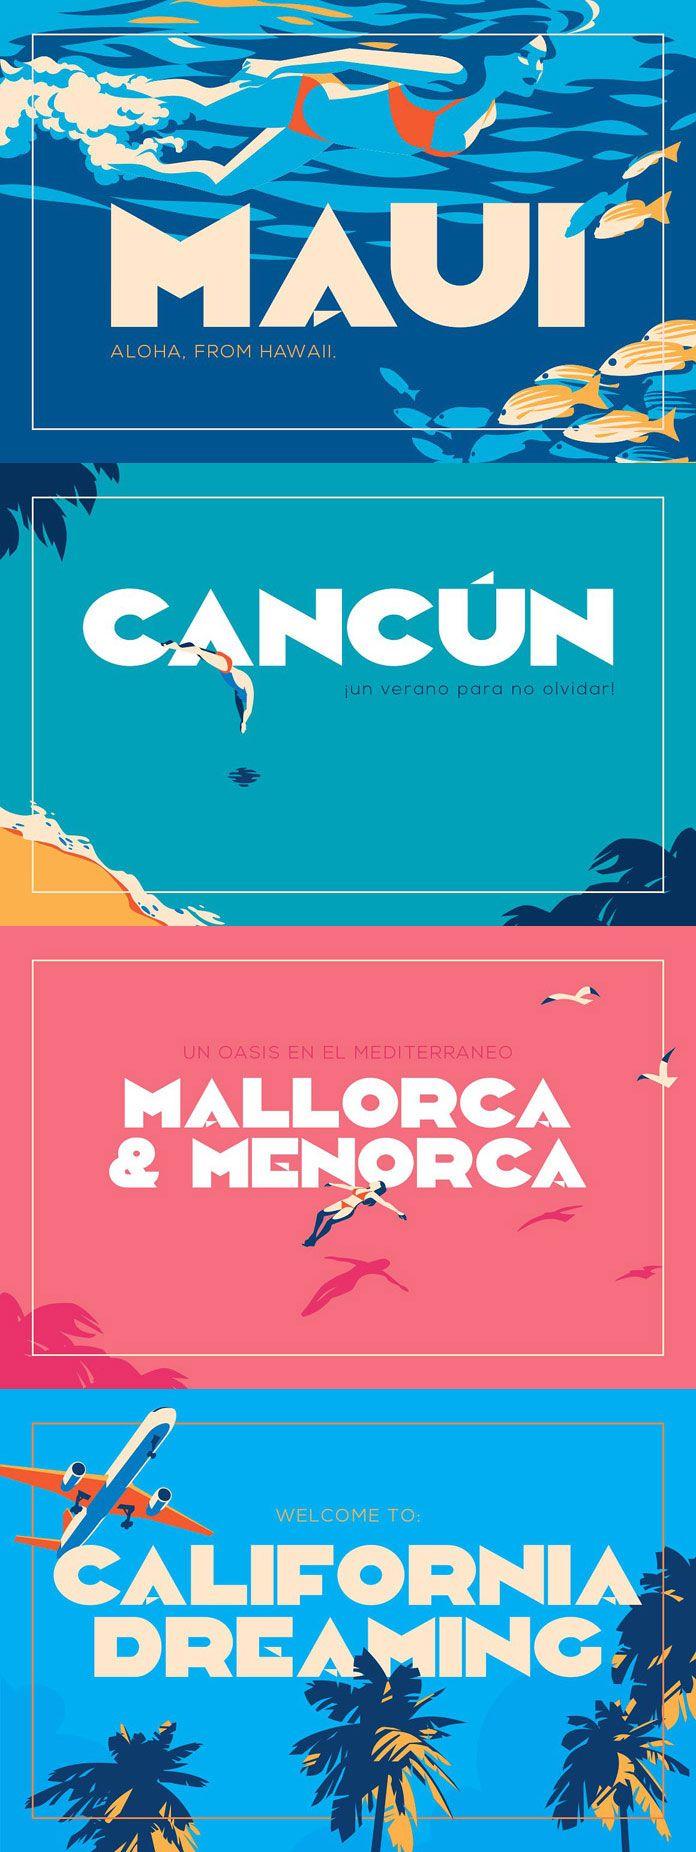 Camar Vintage Font By Juan Miguel Graphic Design Posters Freelance Graphic Design Graphic Design